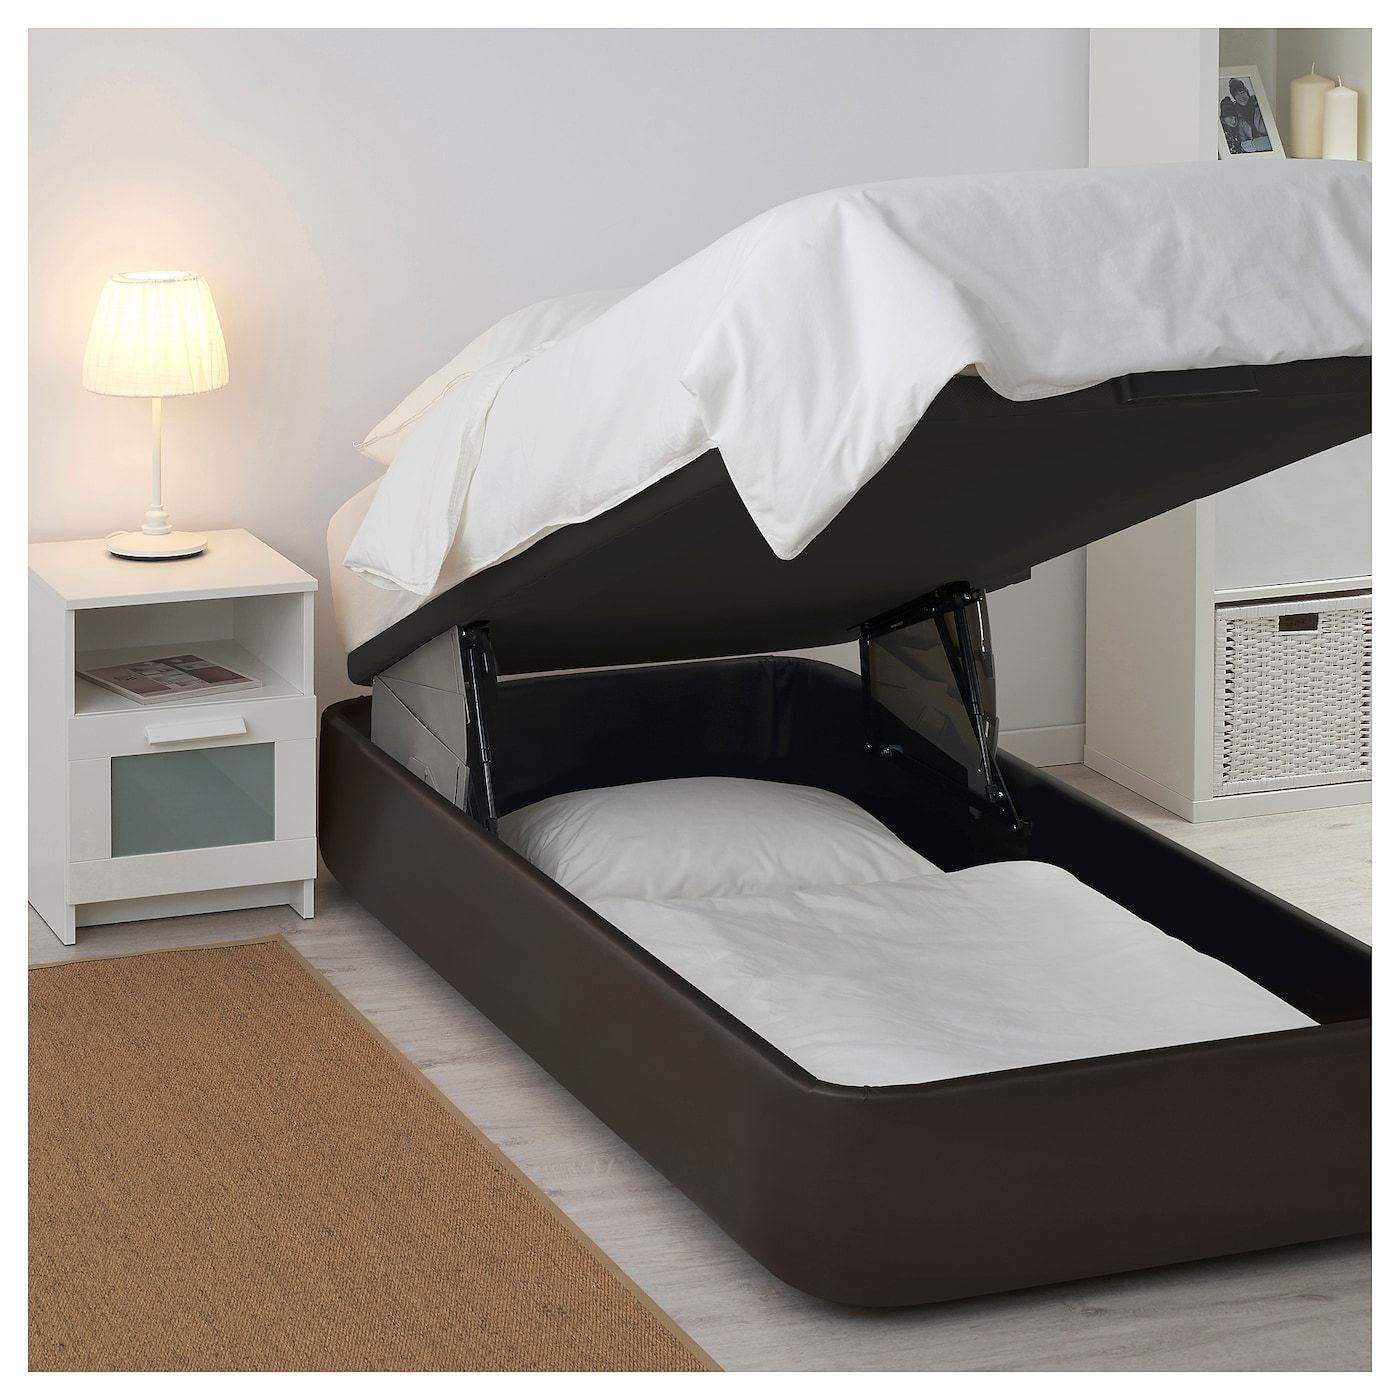 Kvitsoy Upholstered Ottoman Bed Bomstad Dark Brown Ikea Ottoman Bed Upholstered Ottoman Bed